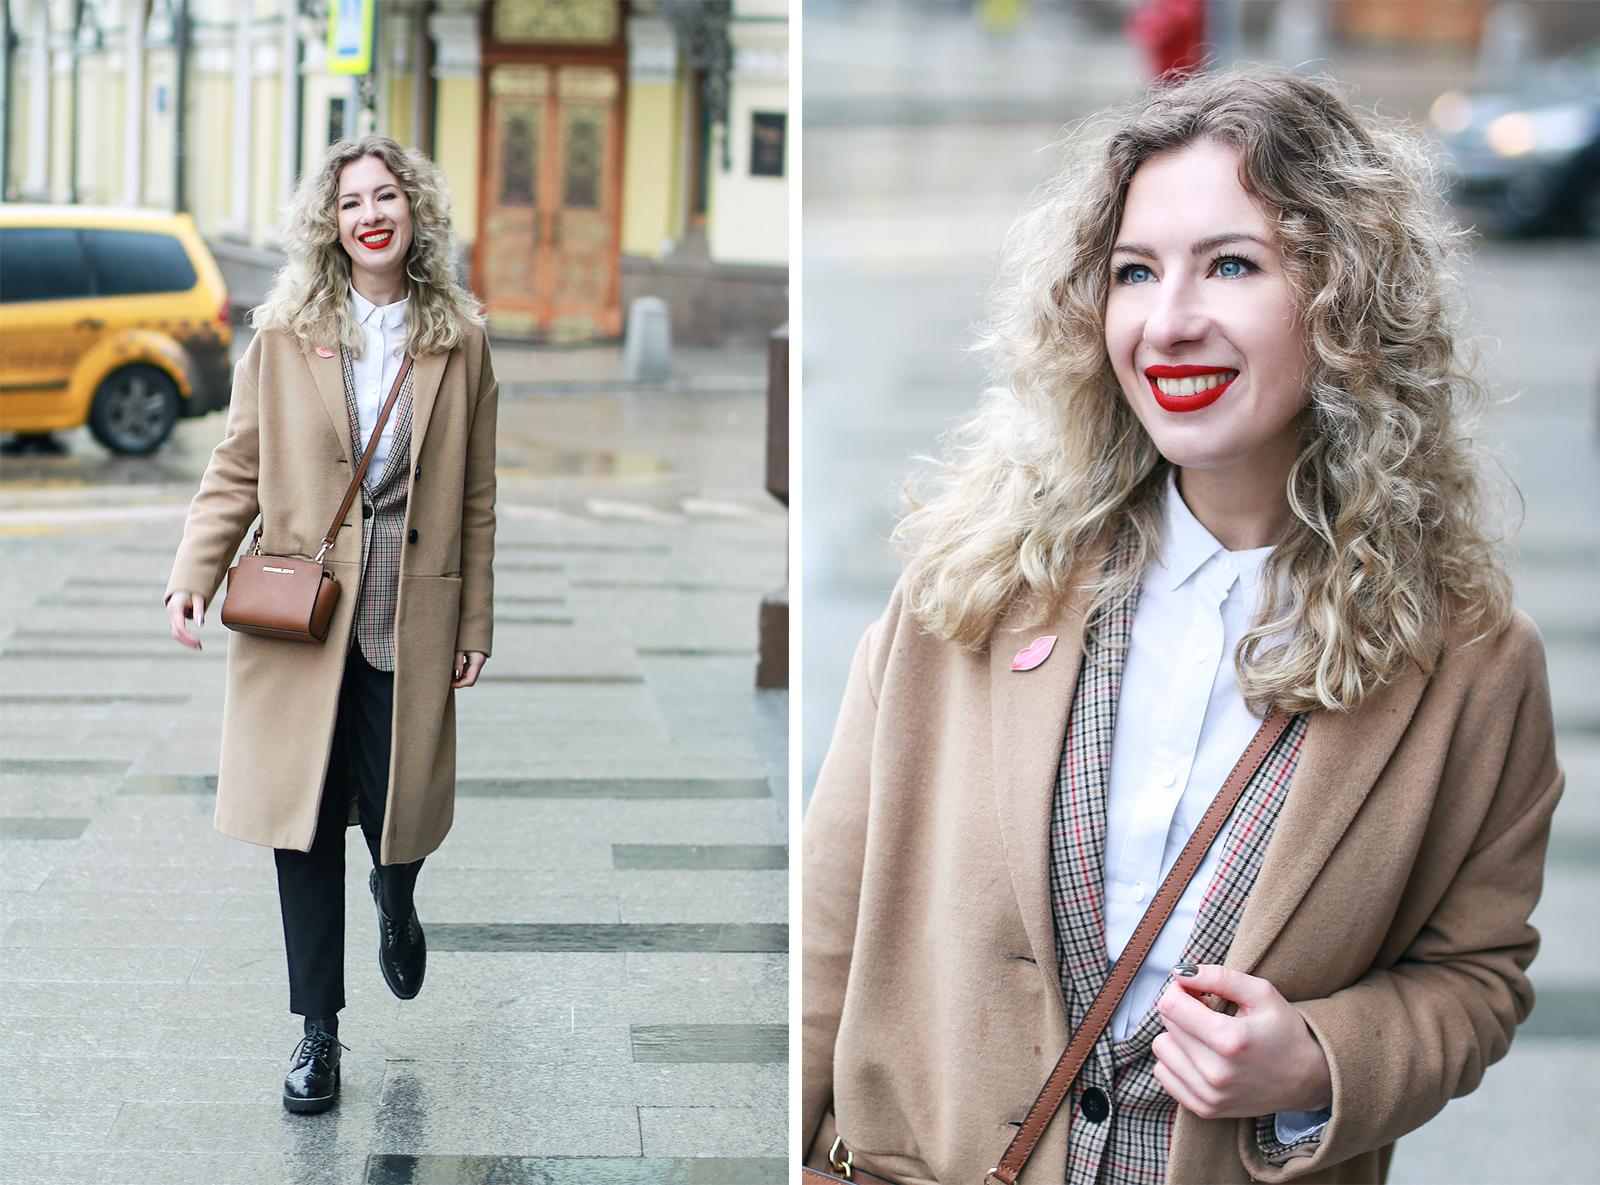 Margarita_Maslova__Ritalifestyle_Fashion_blogger_Moscow_business_casual_spring_looks_work_black_pants